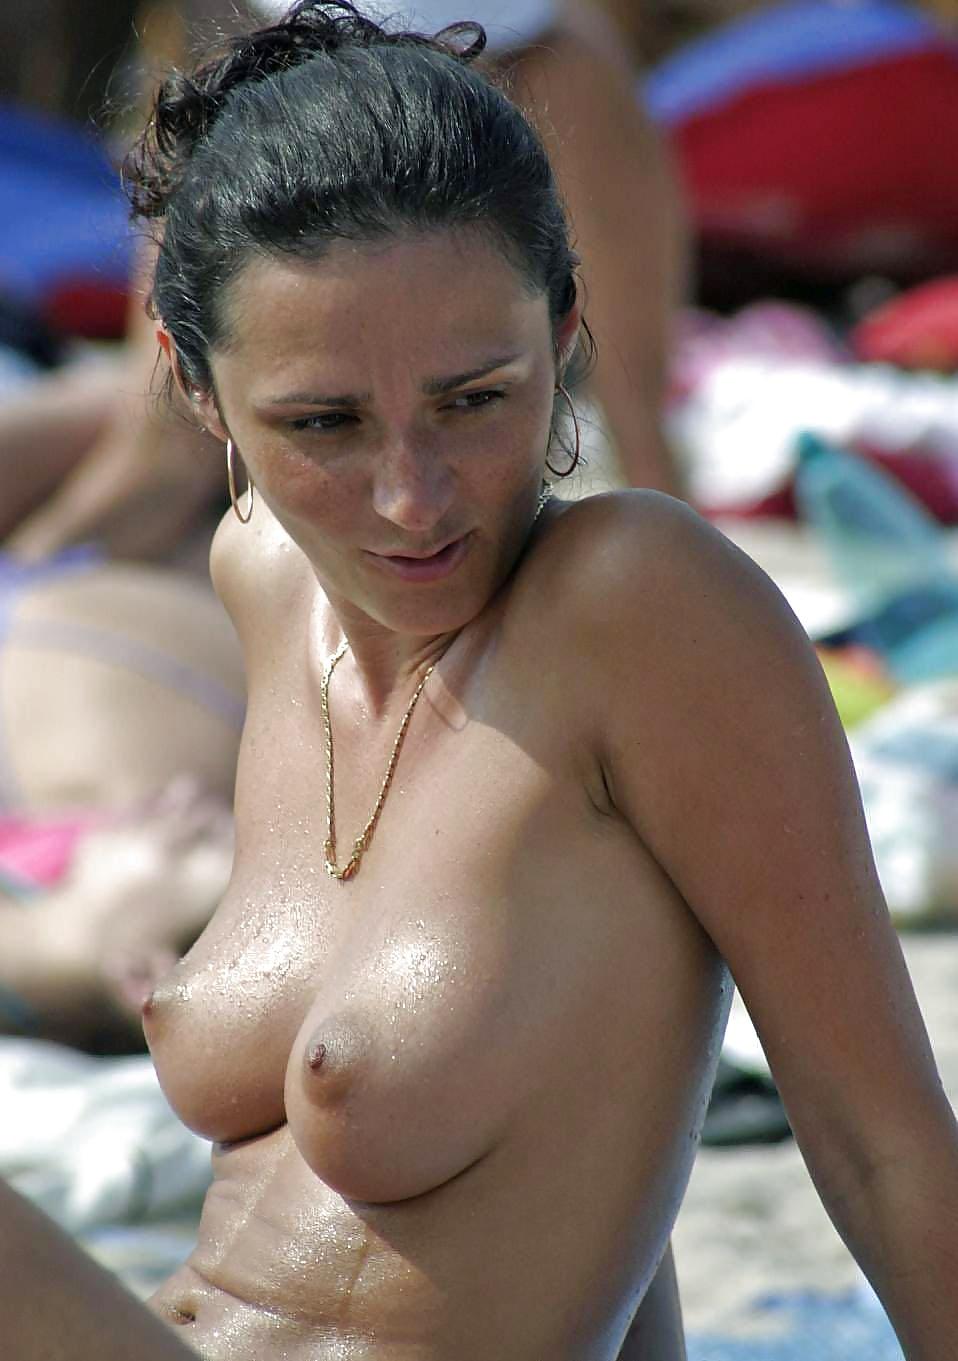 Candid beach tits